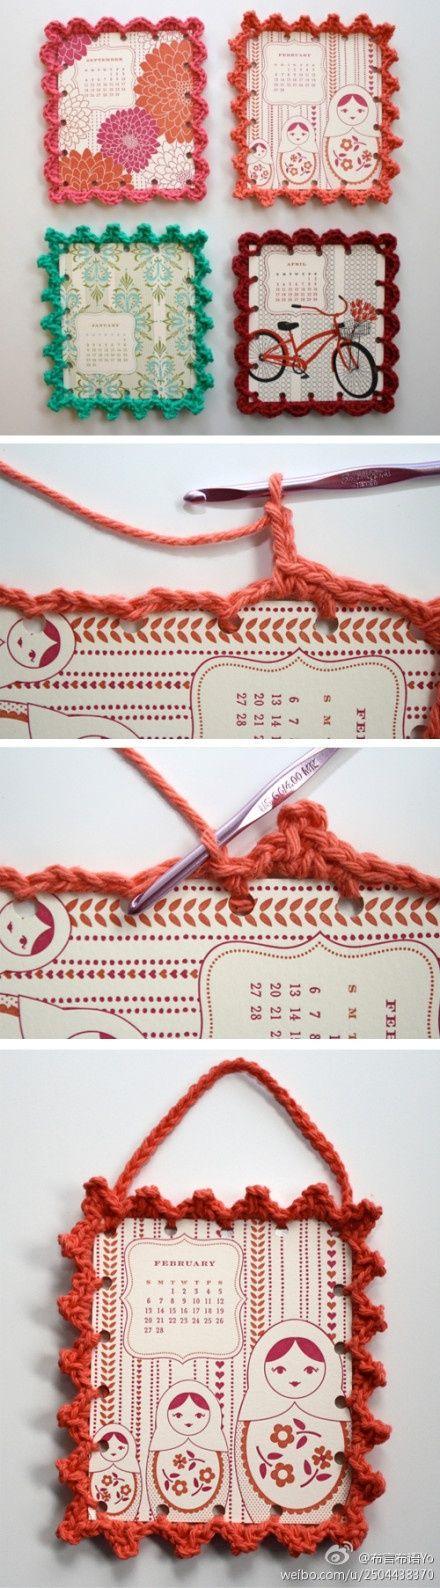 Crocheting Around Cardboard …